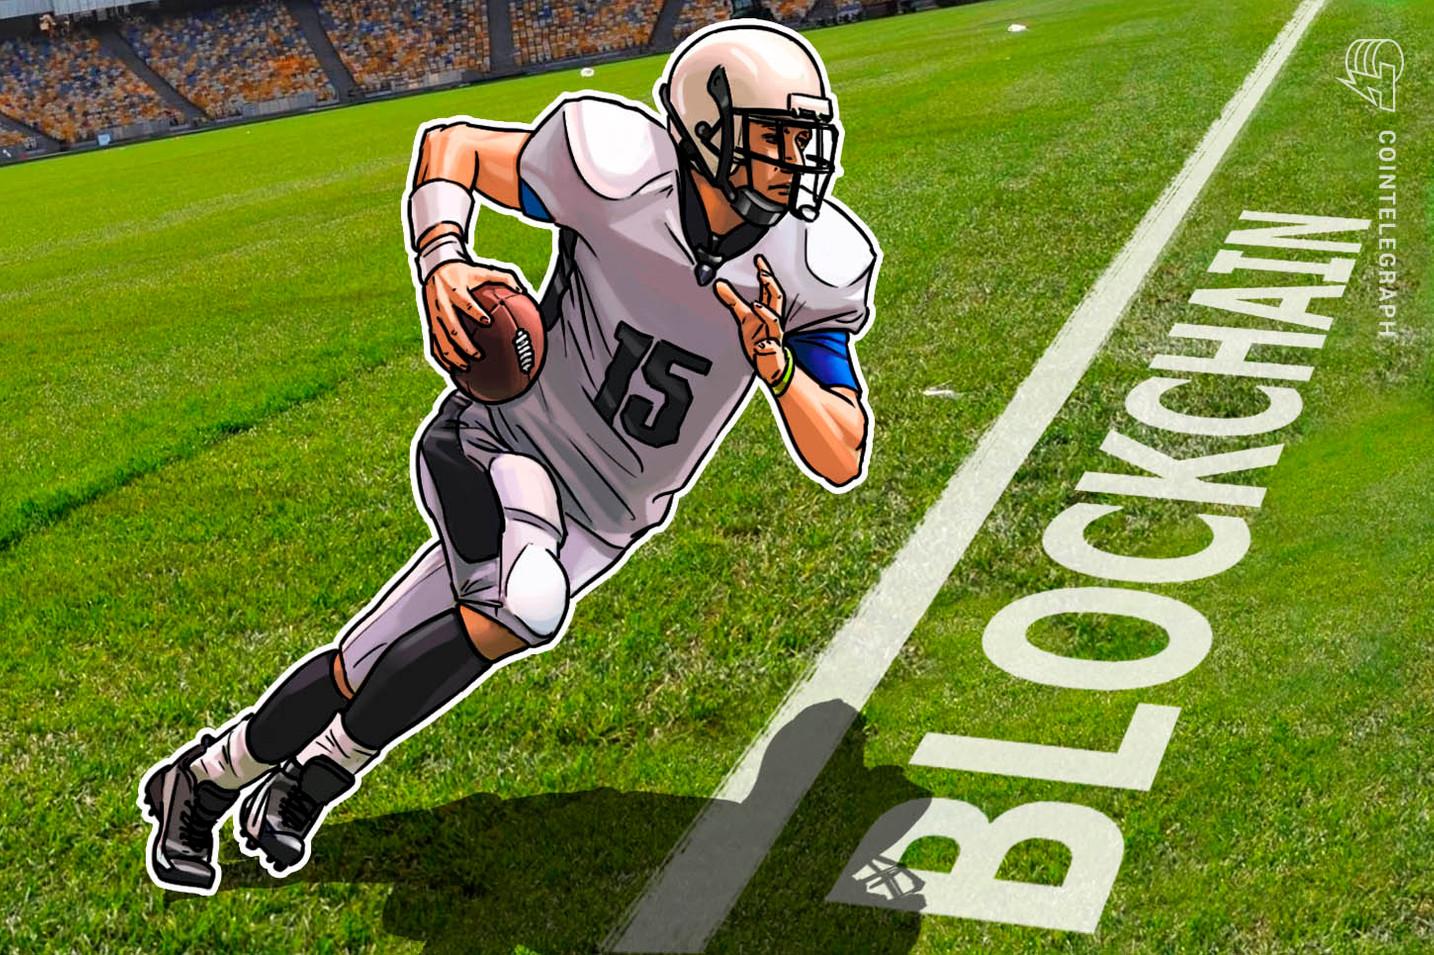 World's Largest Crypto Exchange Binance Invests in Blockchain-Based Esports Platform